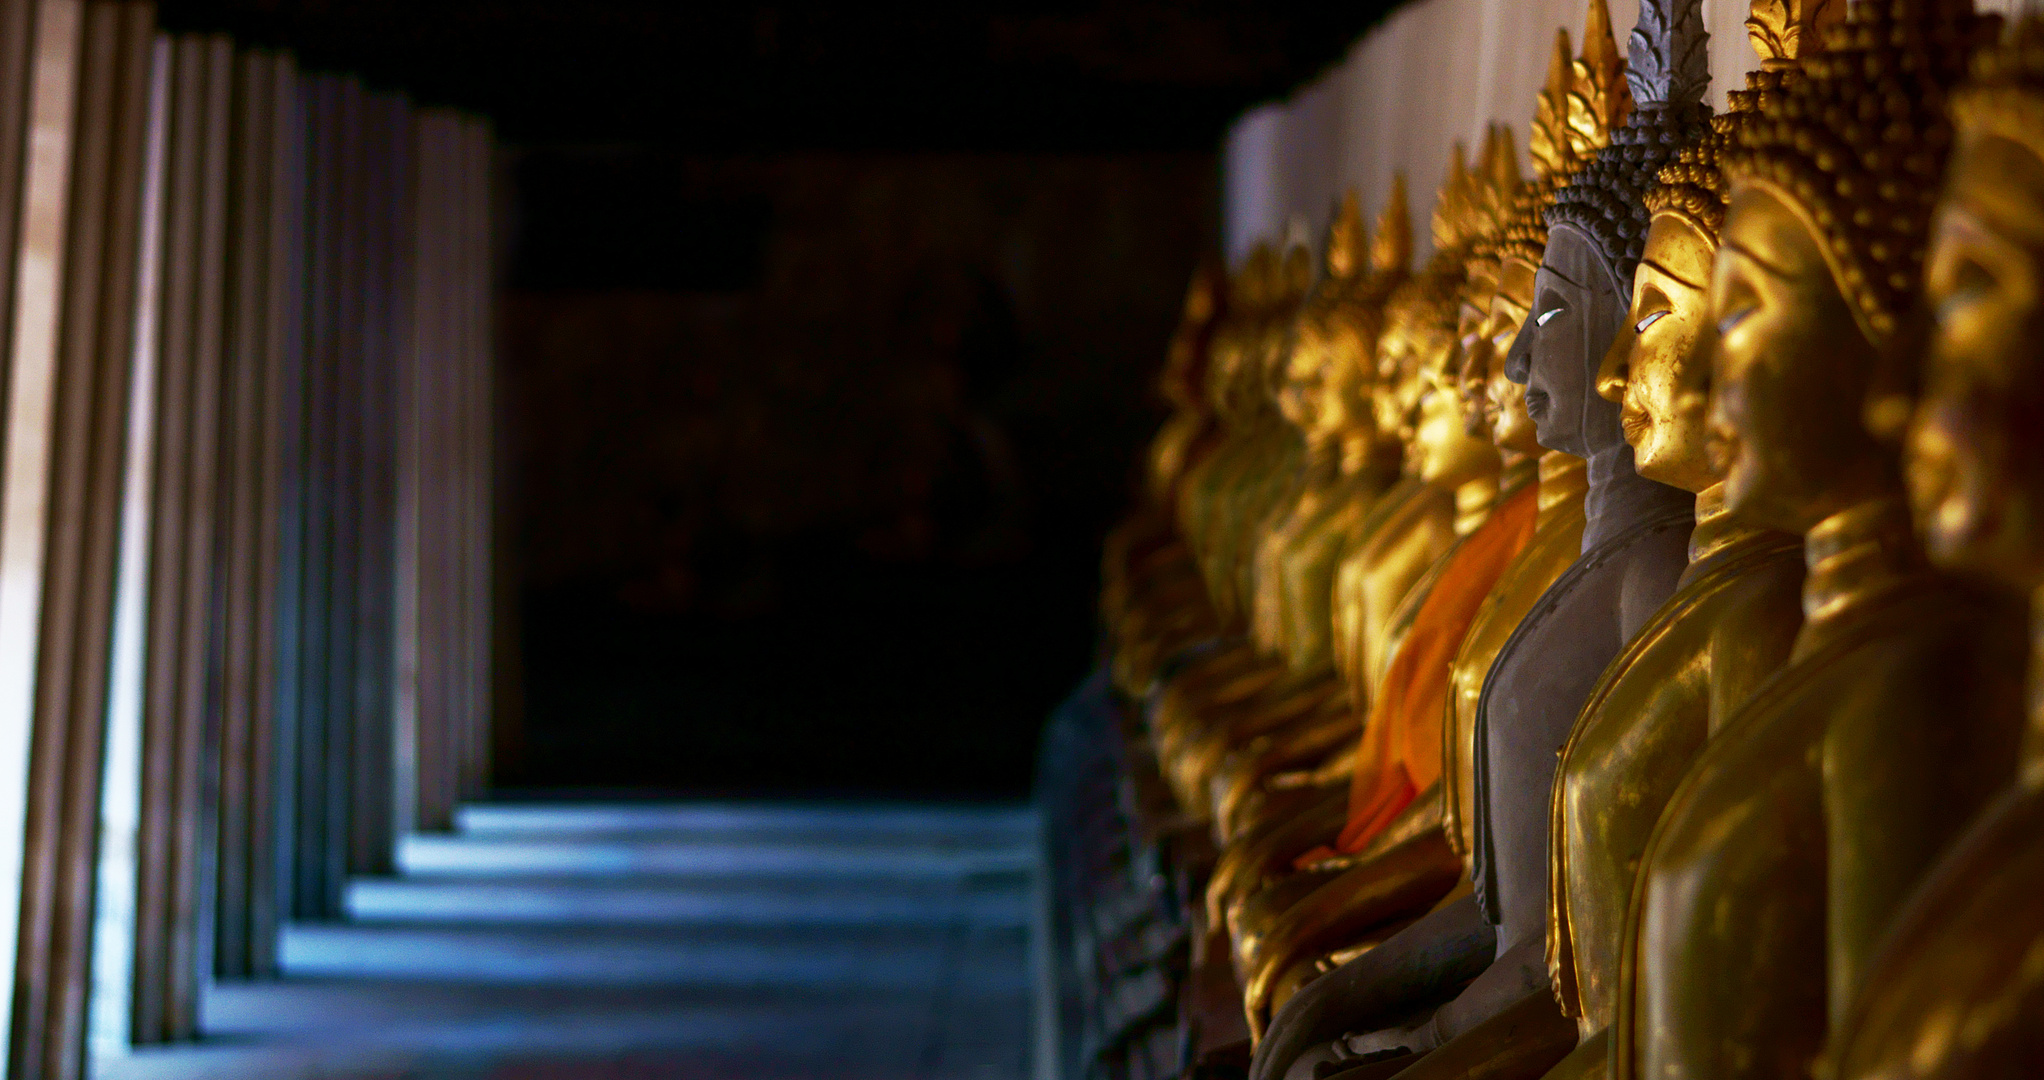 The Black Buddha